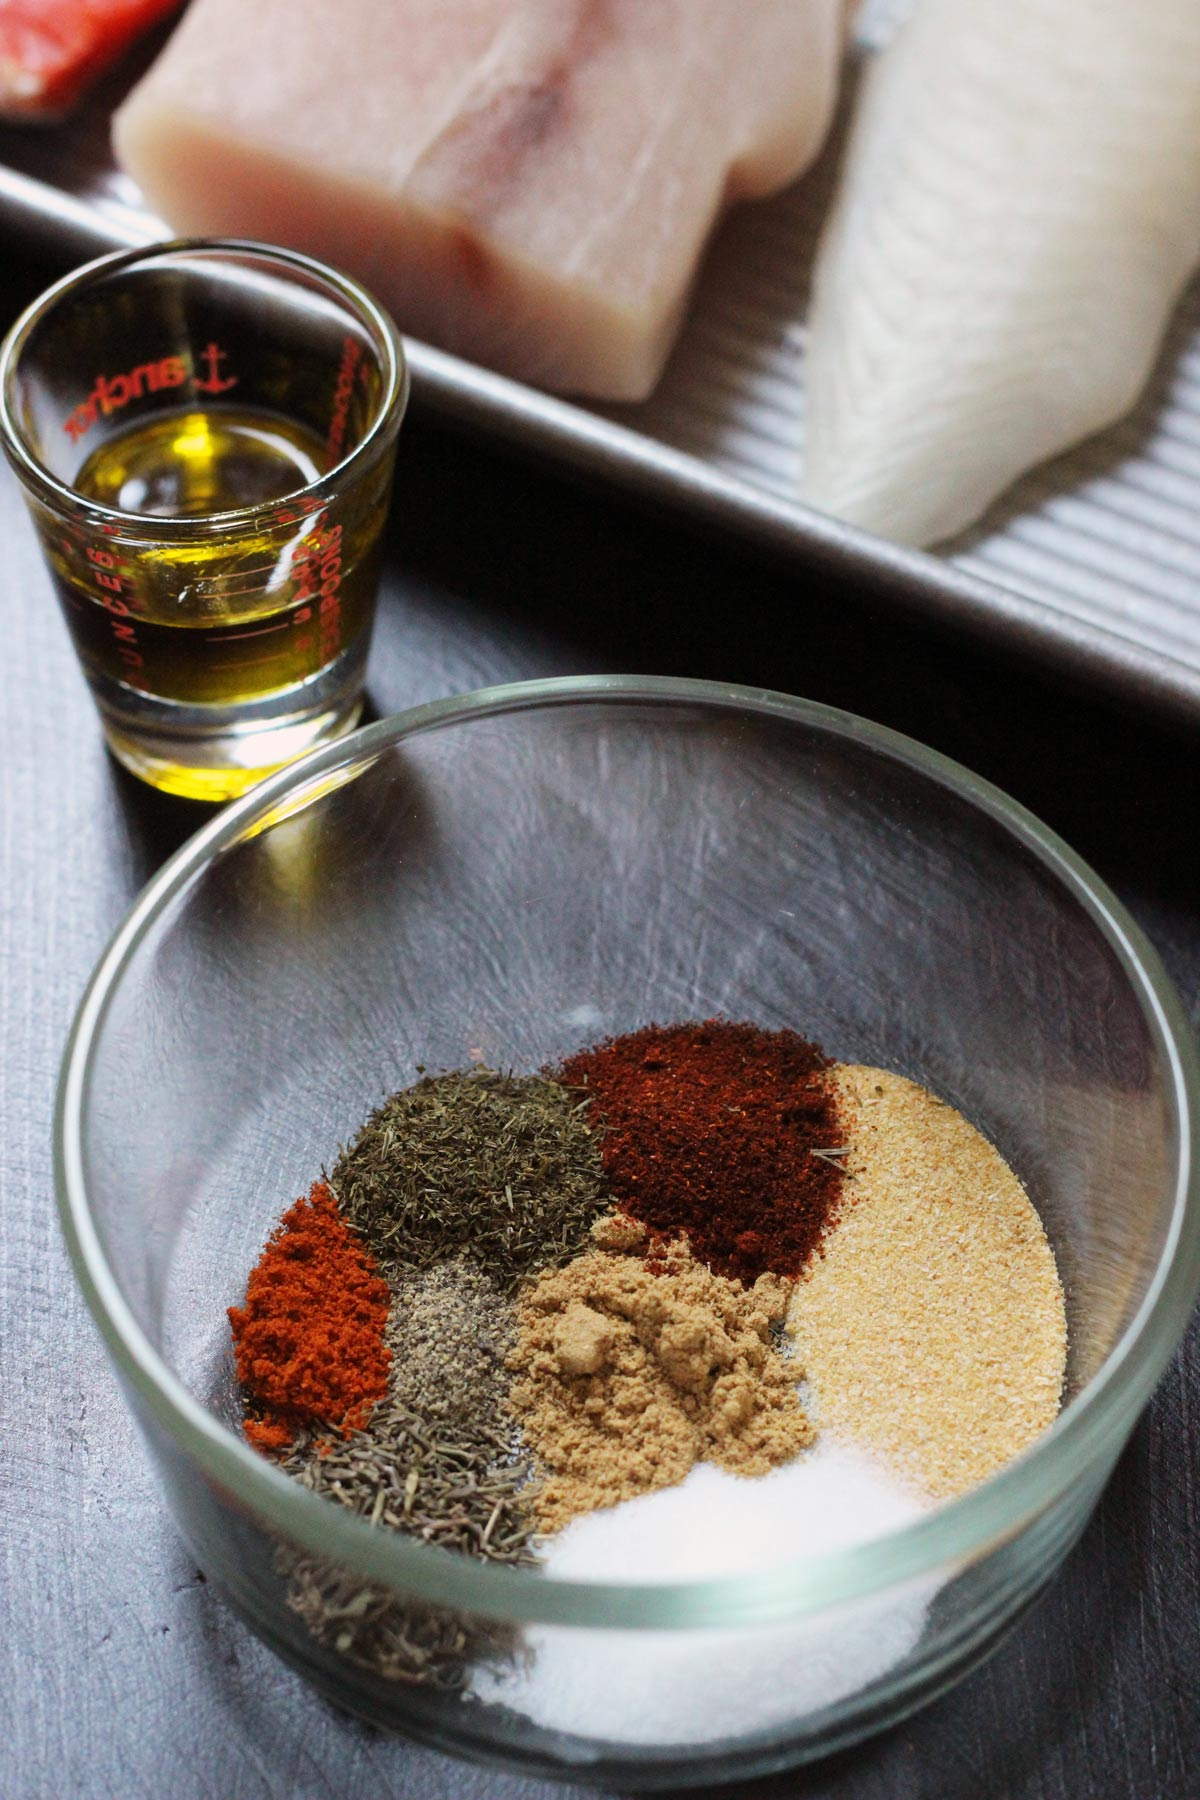 spicy fish rub in dish